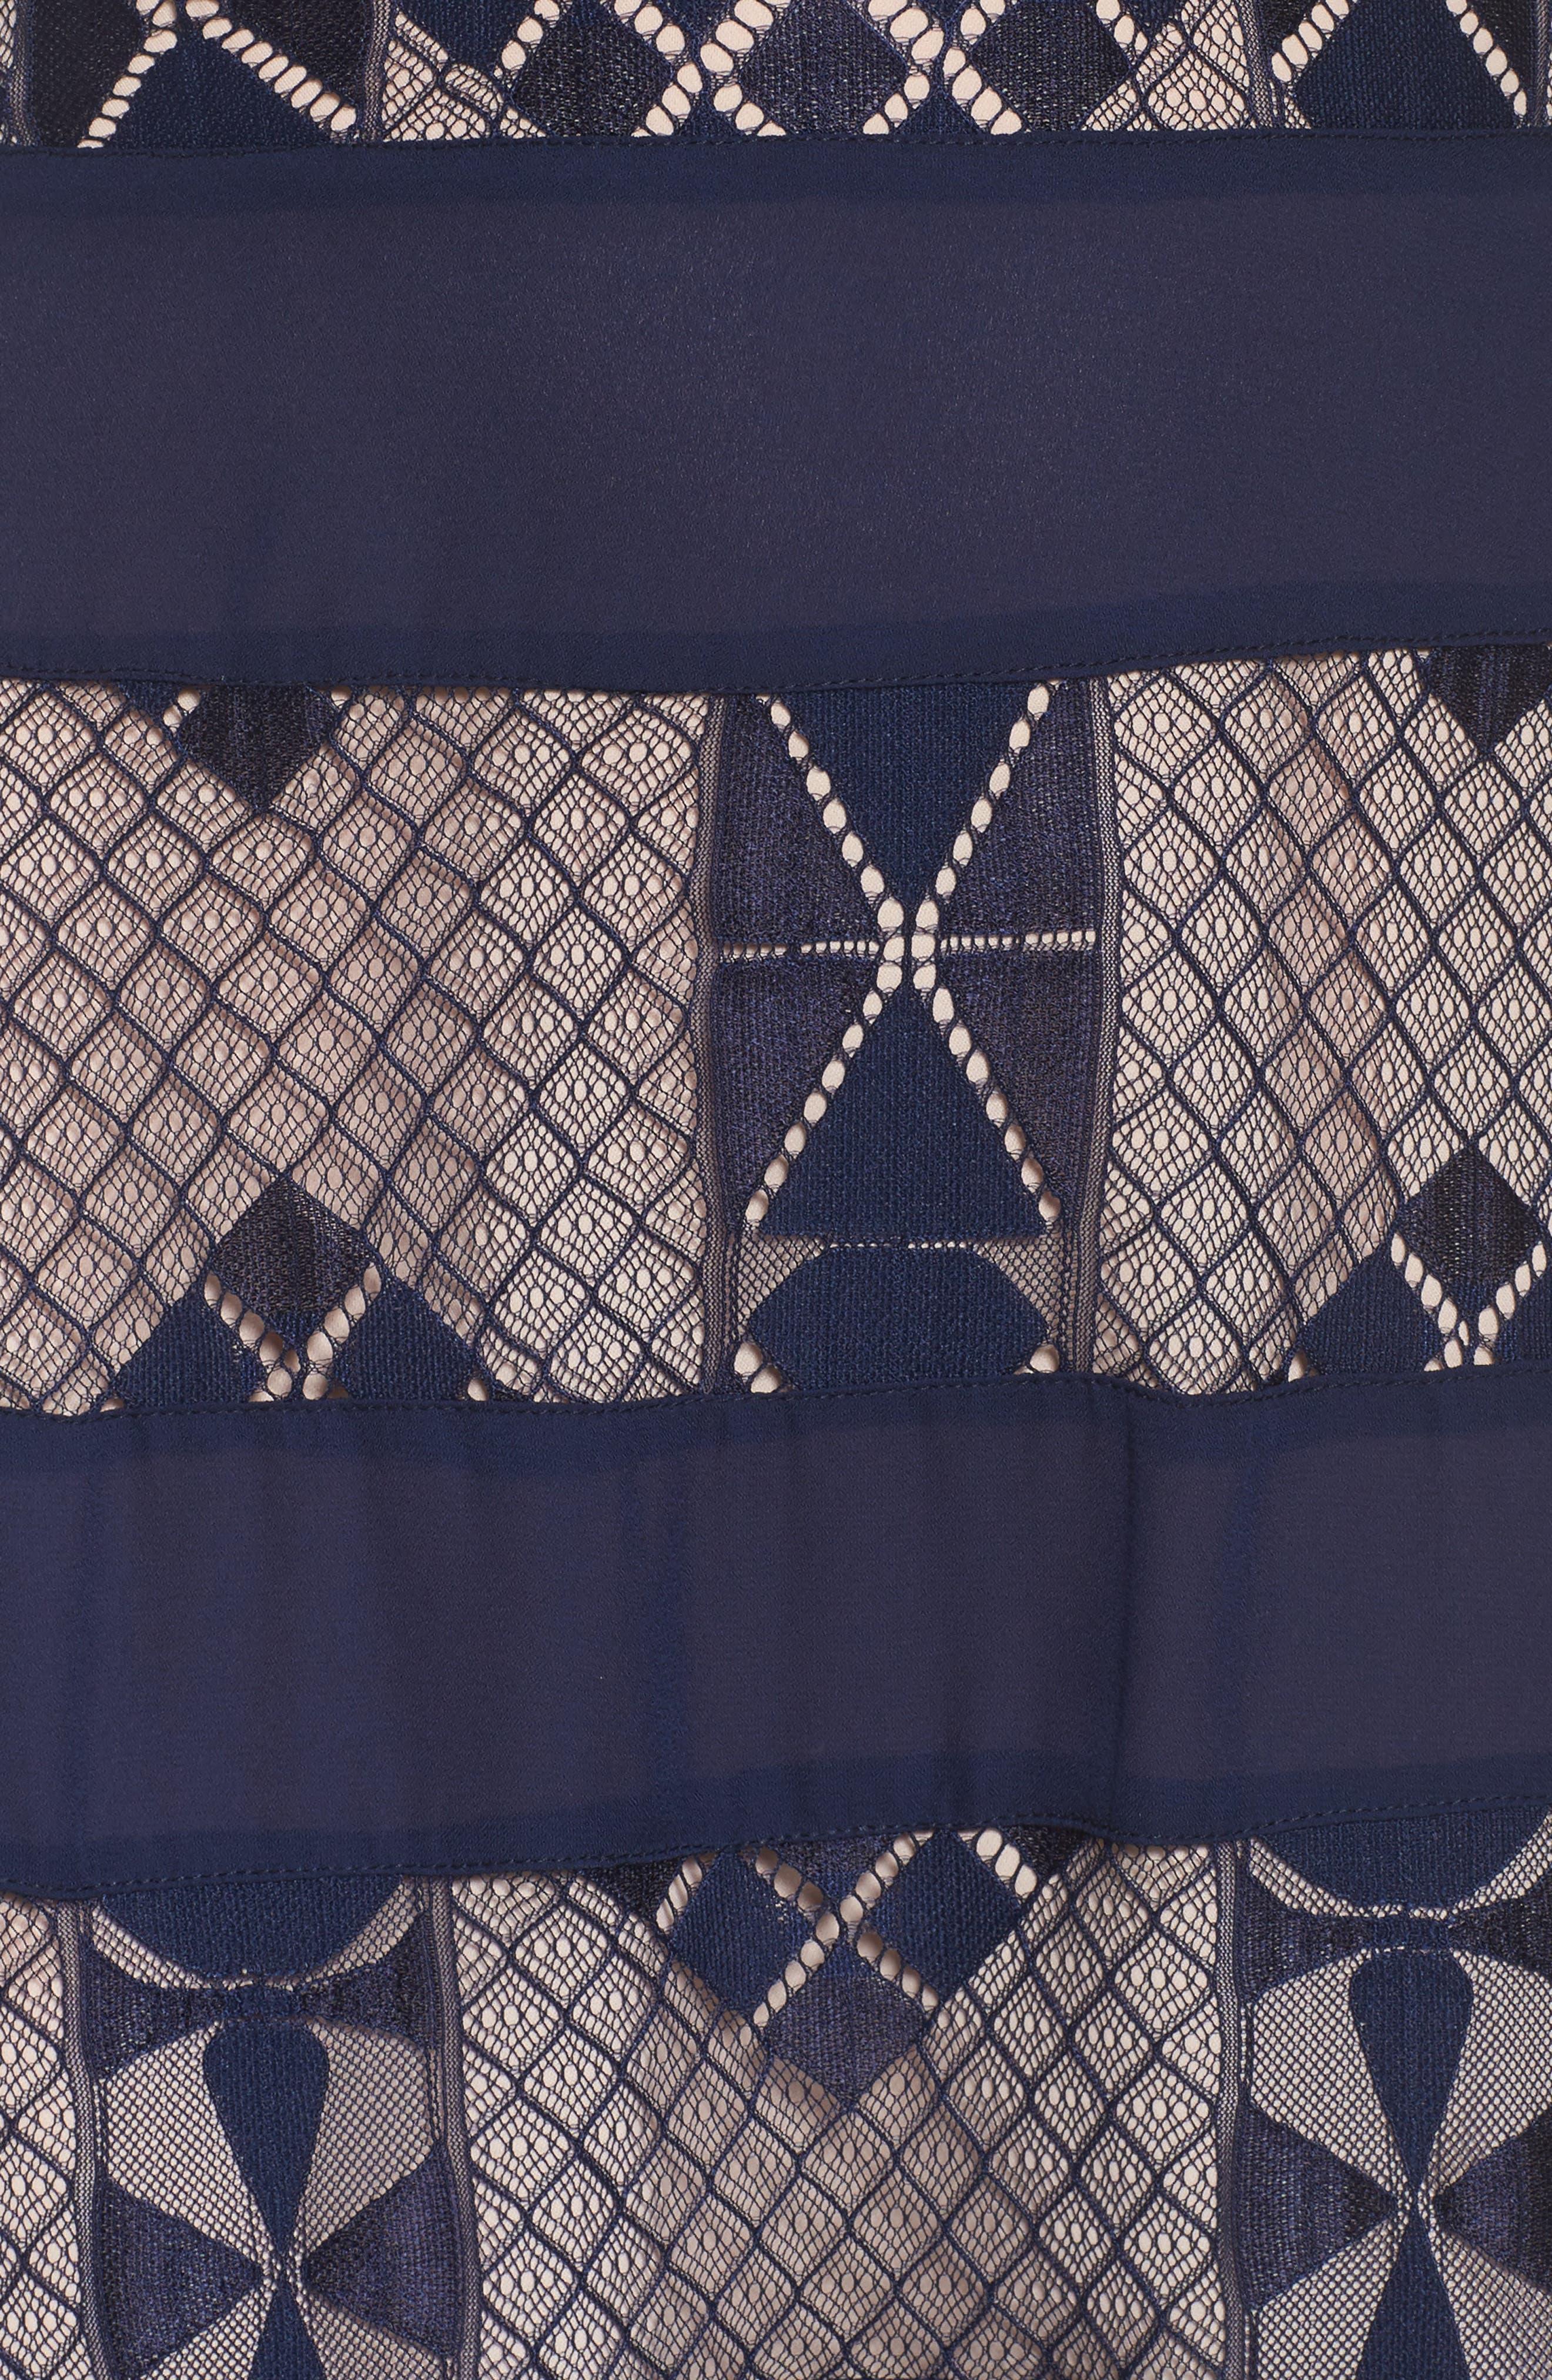 Bravo Zulu Lacy Paneled Dress,                             Alternate thumbnail 5, color,                             414